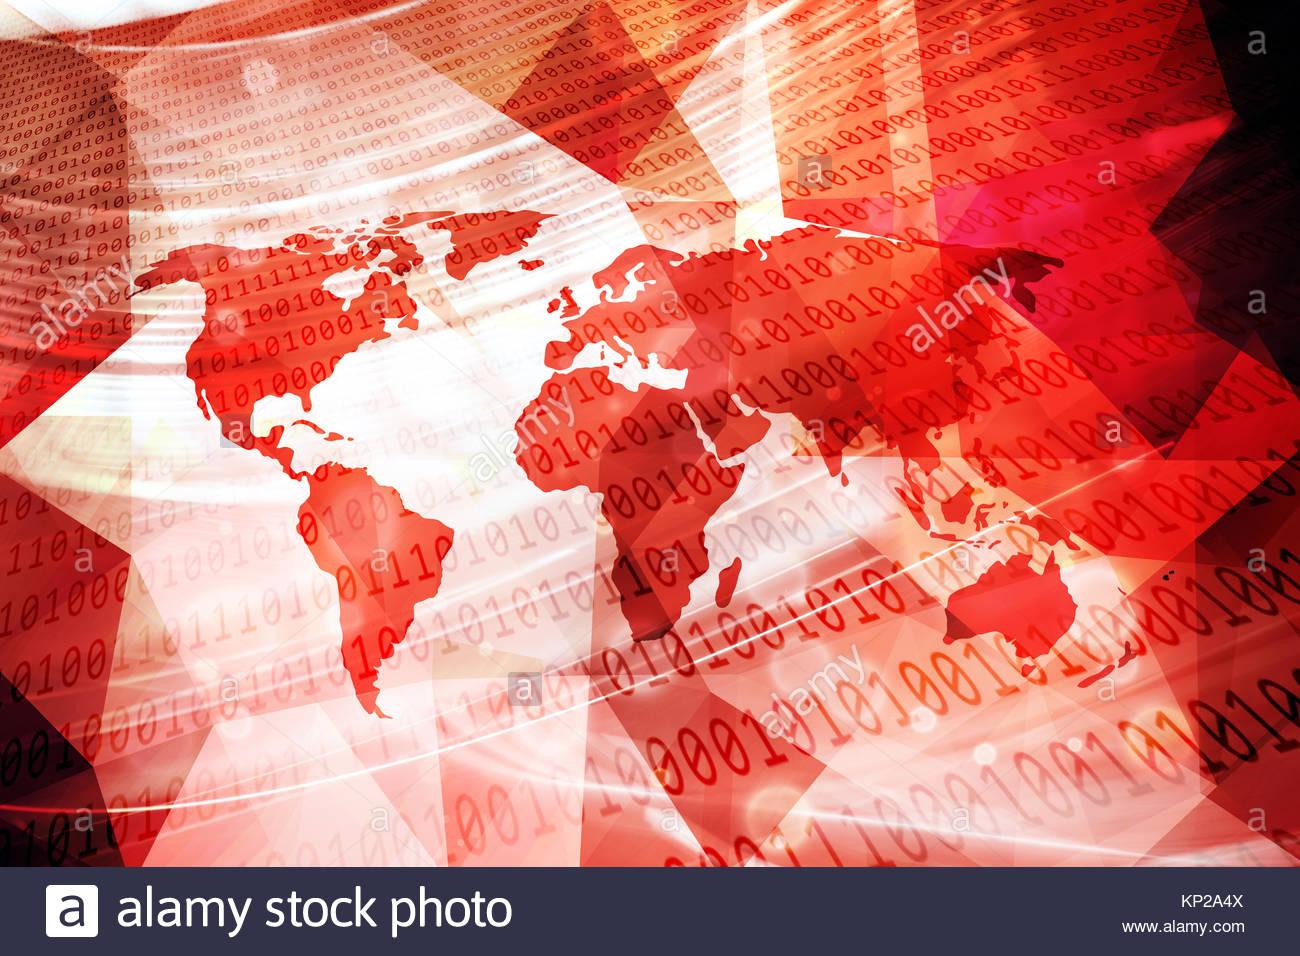 Red tech background world map imgenes de stock red tech mapa del mundo abstracto de color rojo con equipo de nmeros binarios ilustracin de fondo gumiabroncs Image collections